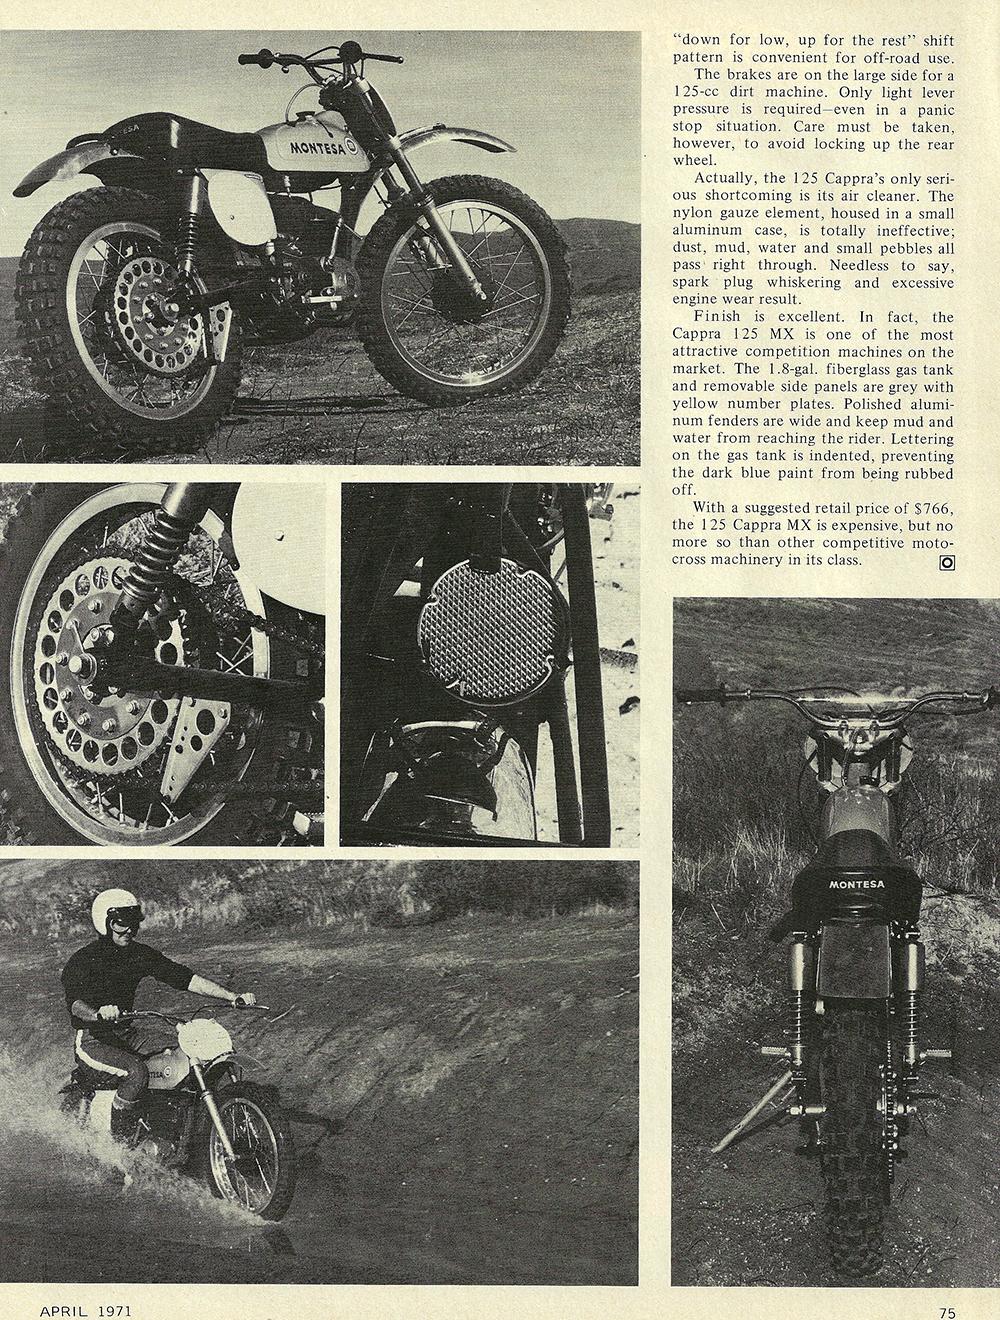 1971 Montesa Cappra 125 MX impression 02.jpg